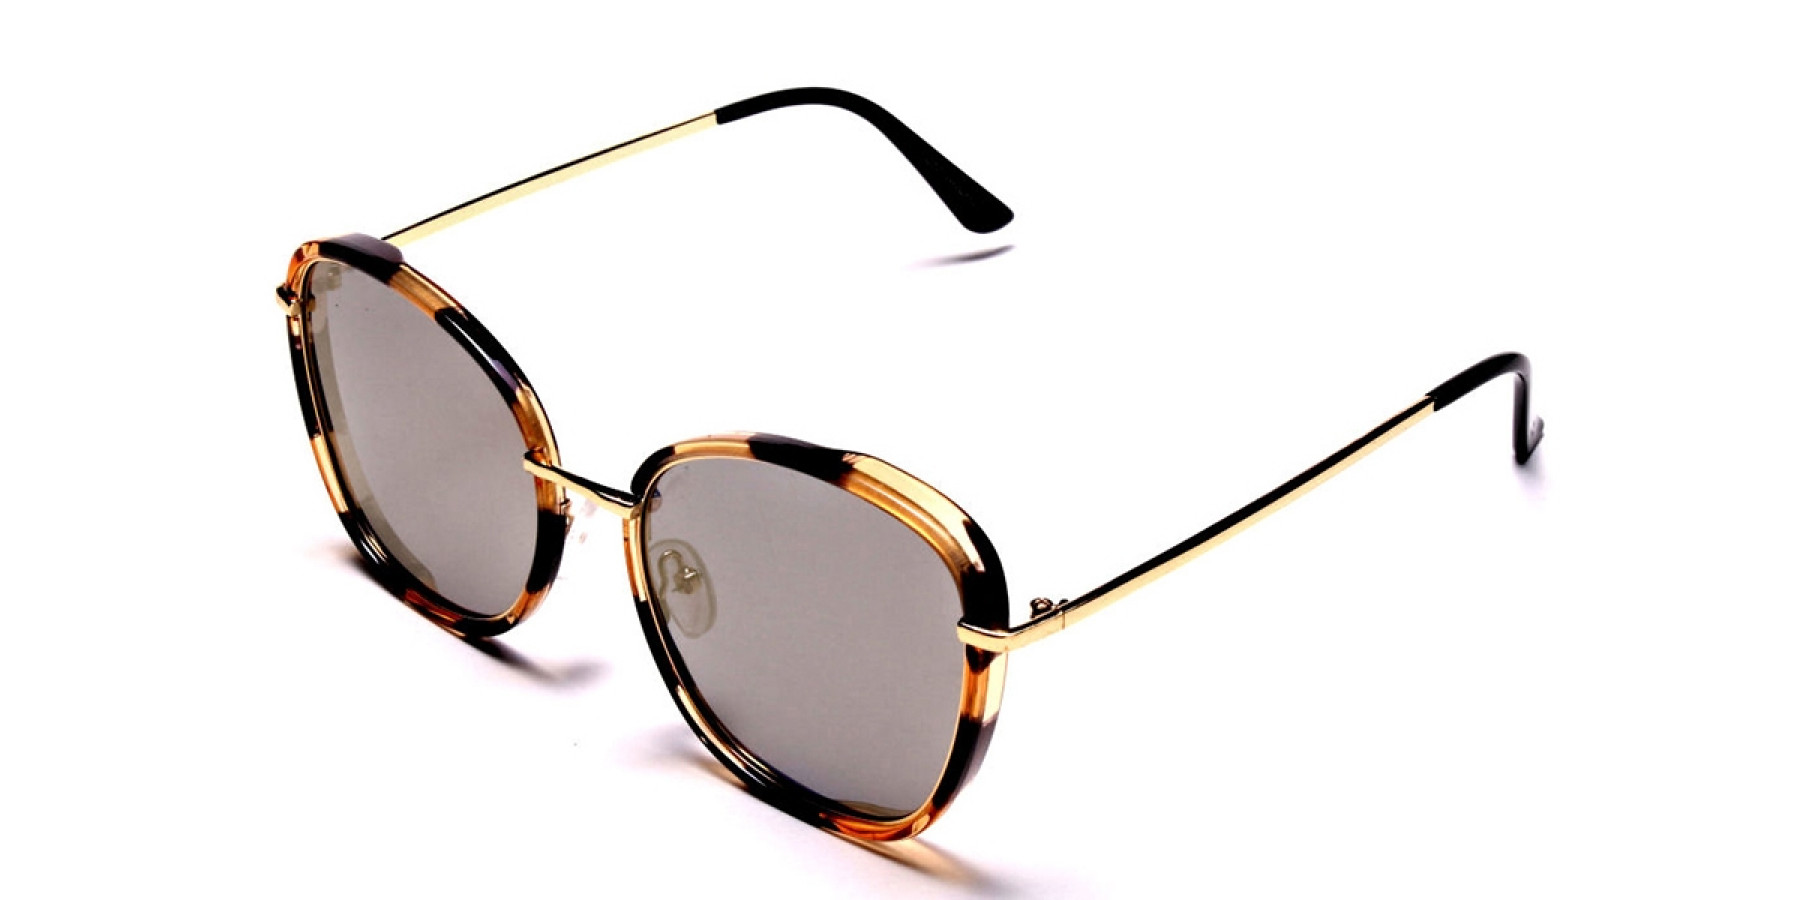 Havana & Tortoiseshell Oversized Sunglasses - 2